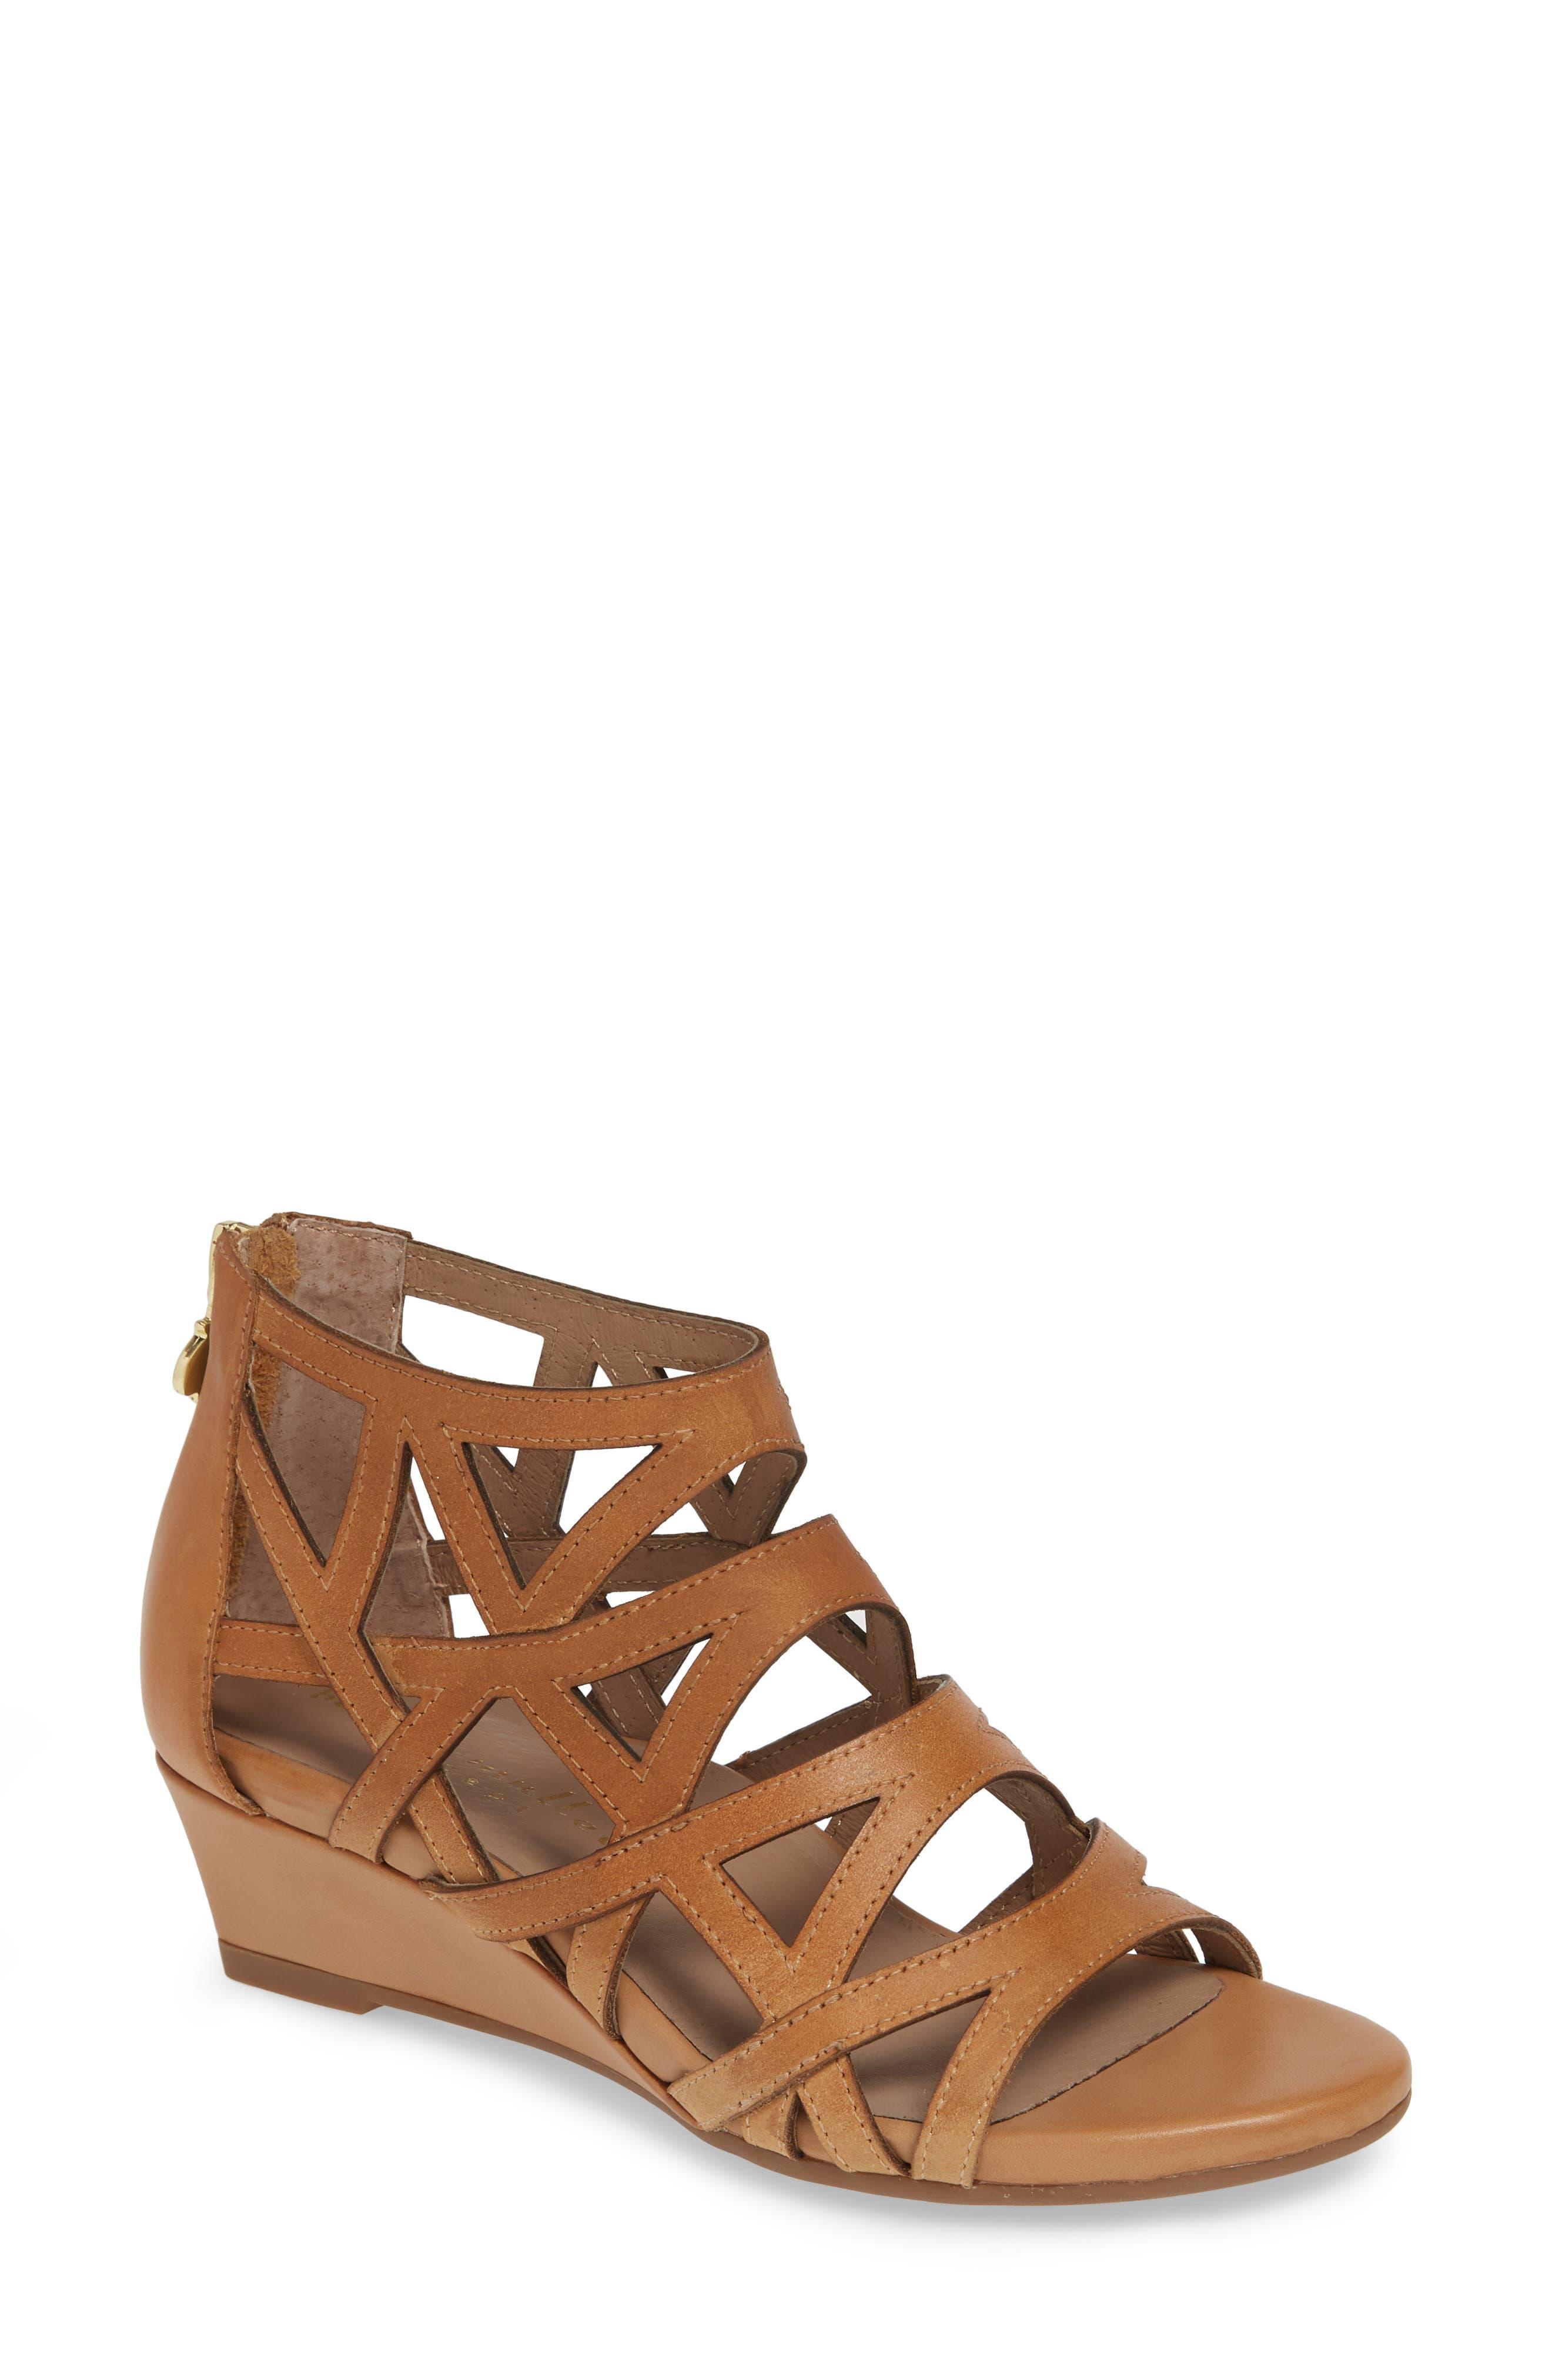 Bettye Muller Concepts Sashi Cutout Sandal, Brown